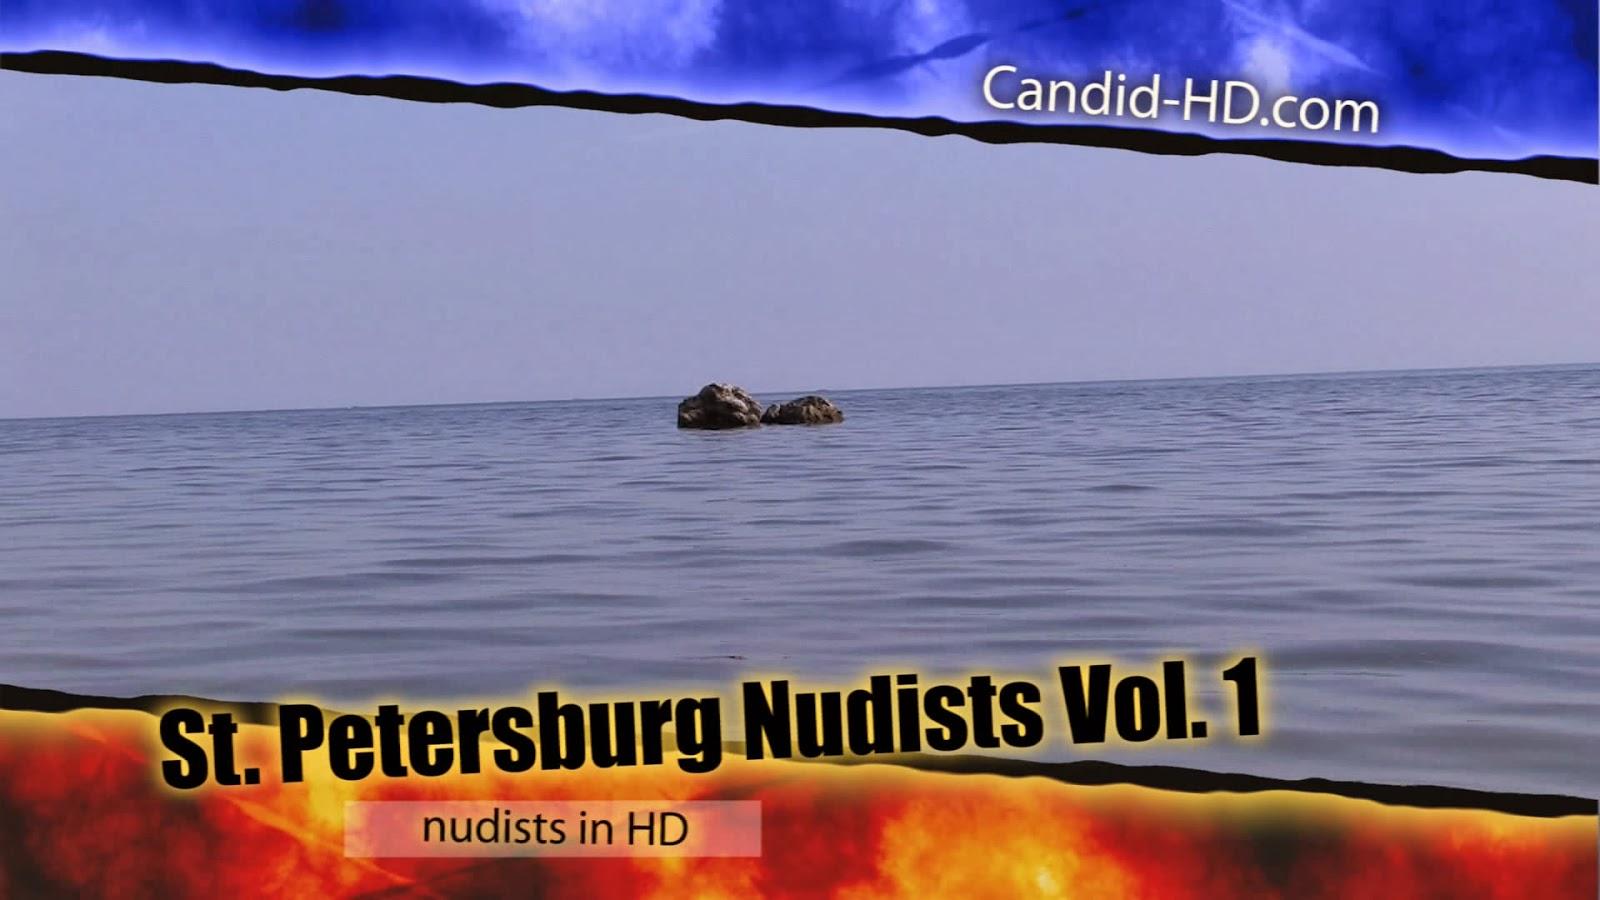 Нудистки Санкт-Петербурга 1 / St. Petersburg Nudists 1. FULL HD.